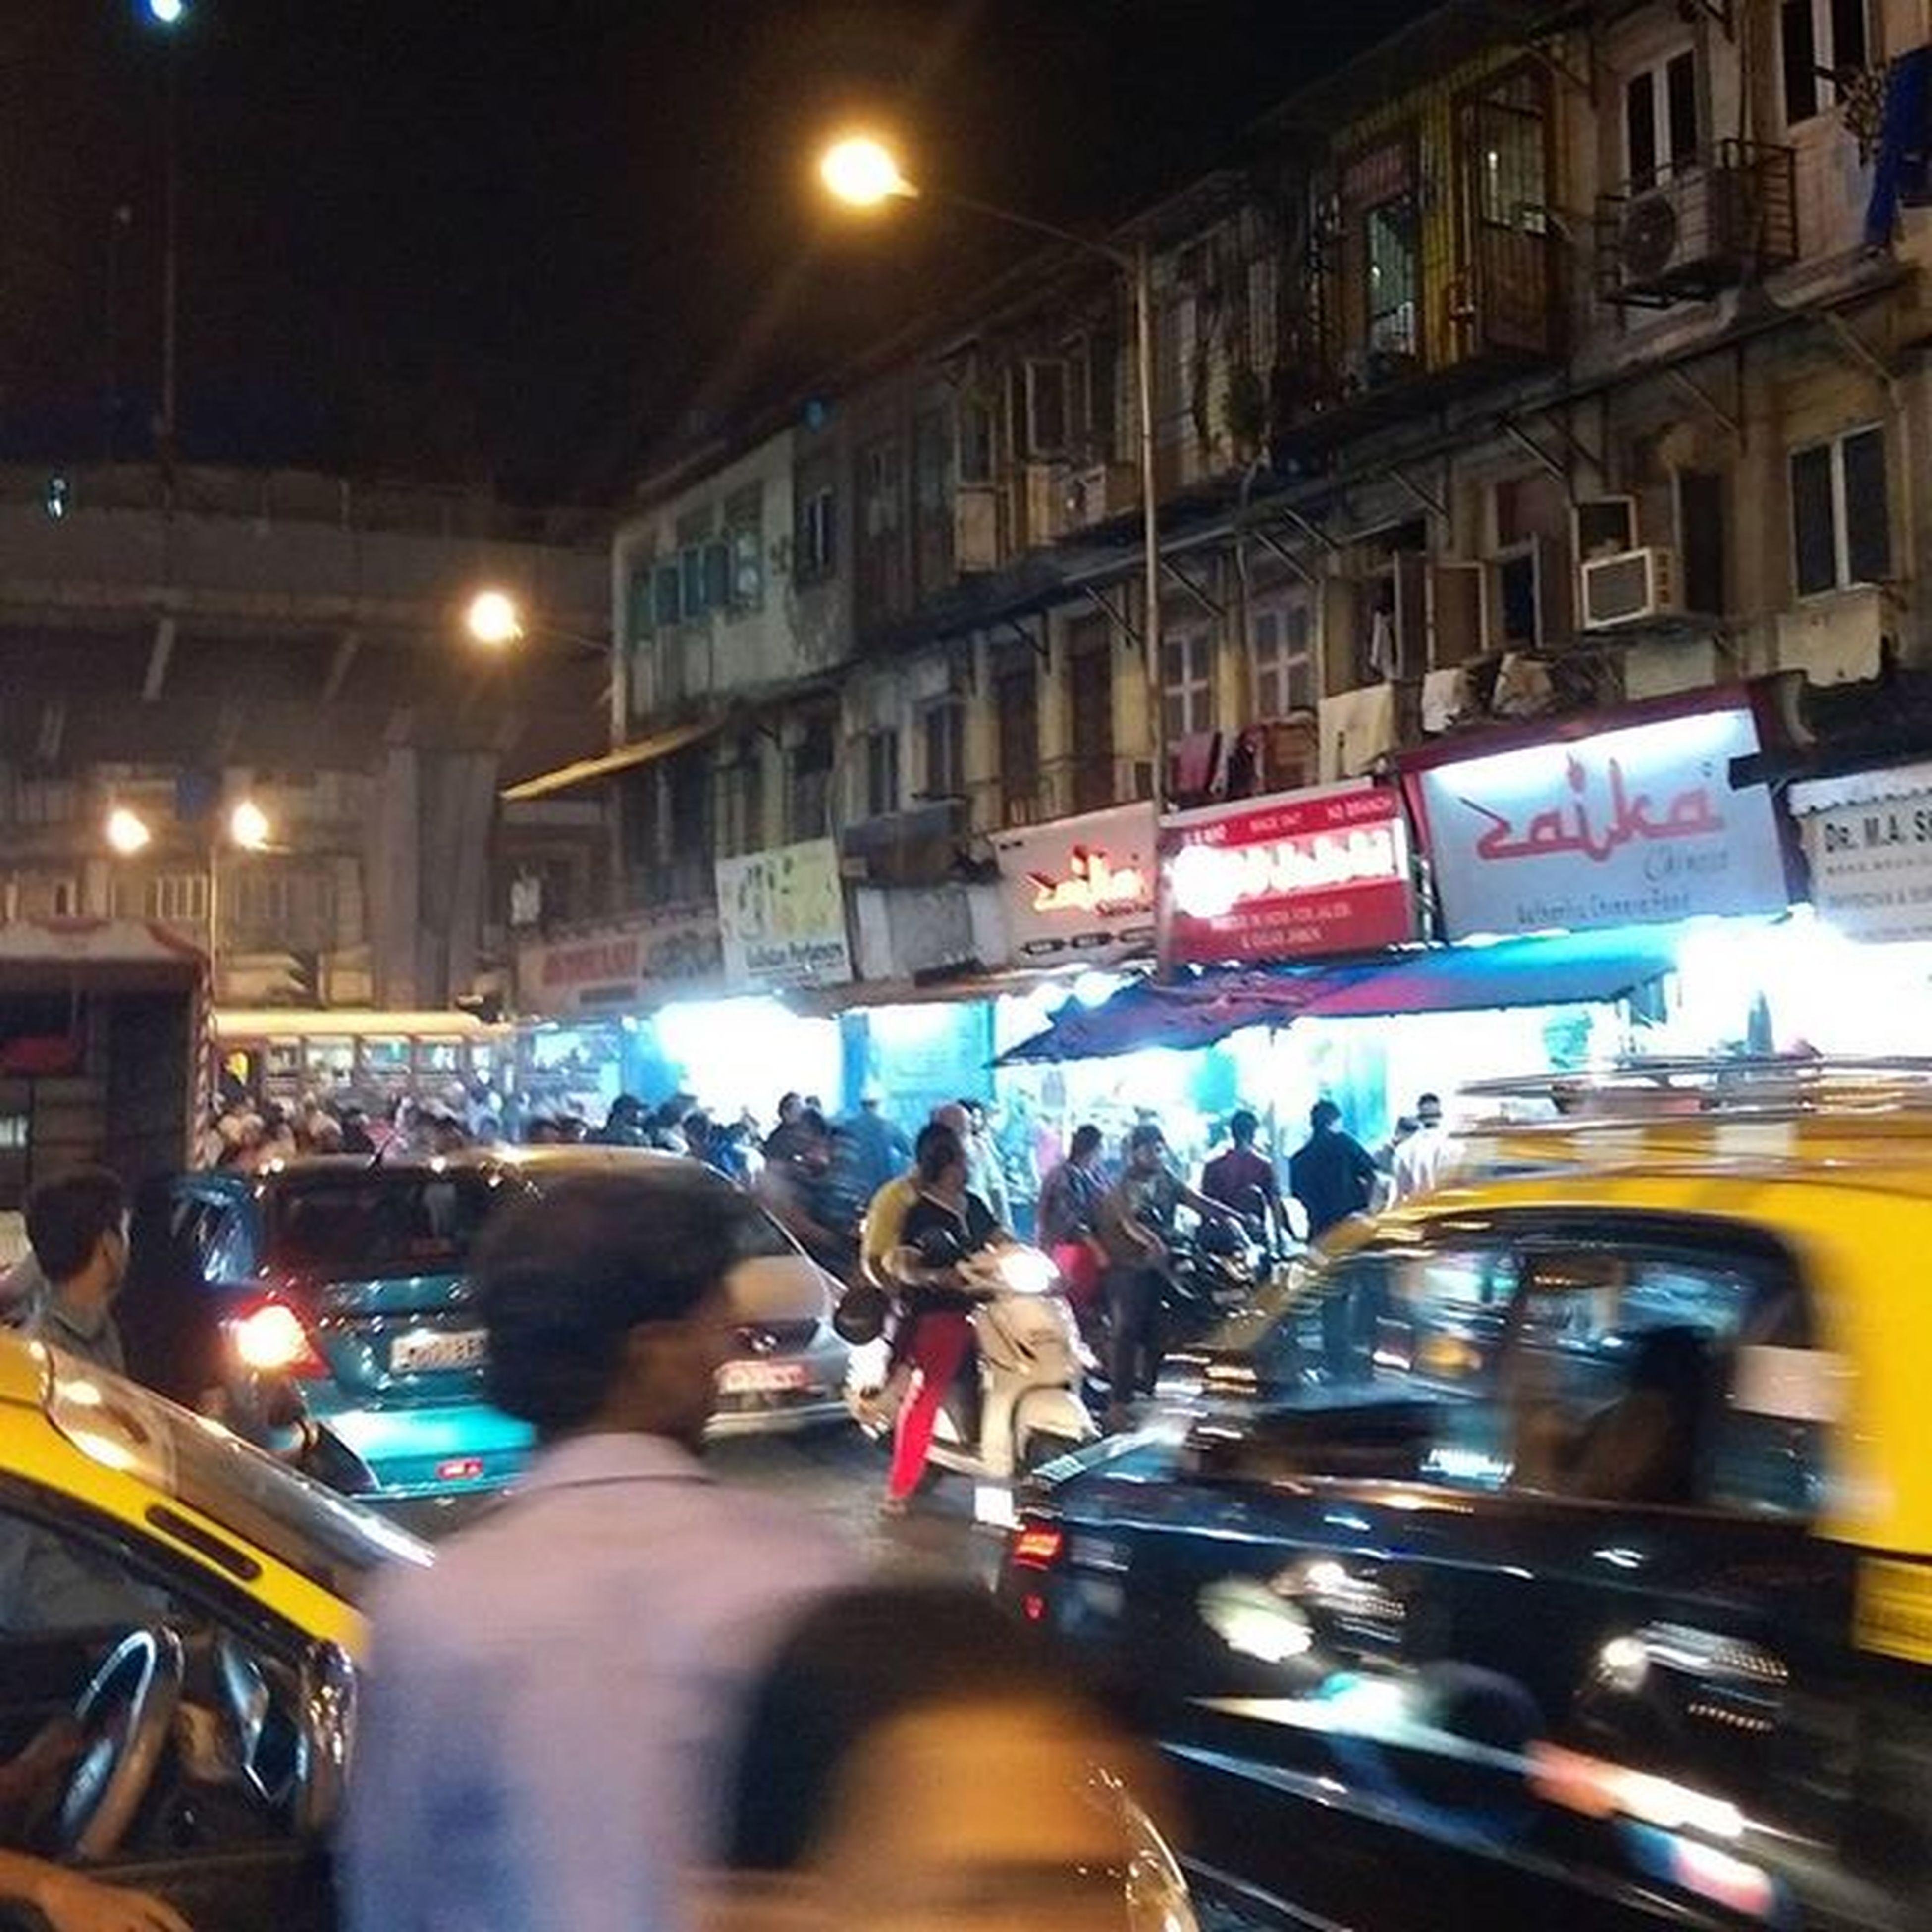 Perks of ramzan. Late night amazing food on streets. Jj  Nagpada Mohammedaliroad Ramzan Food Zaika Instagram Mumbai Igers Indian